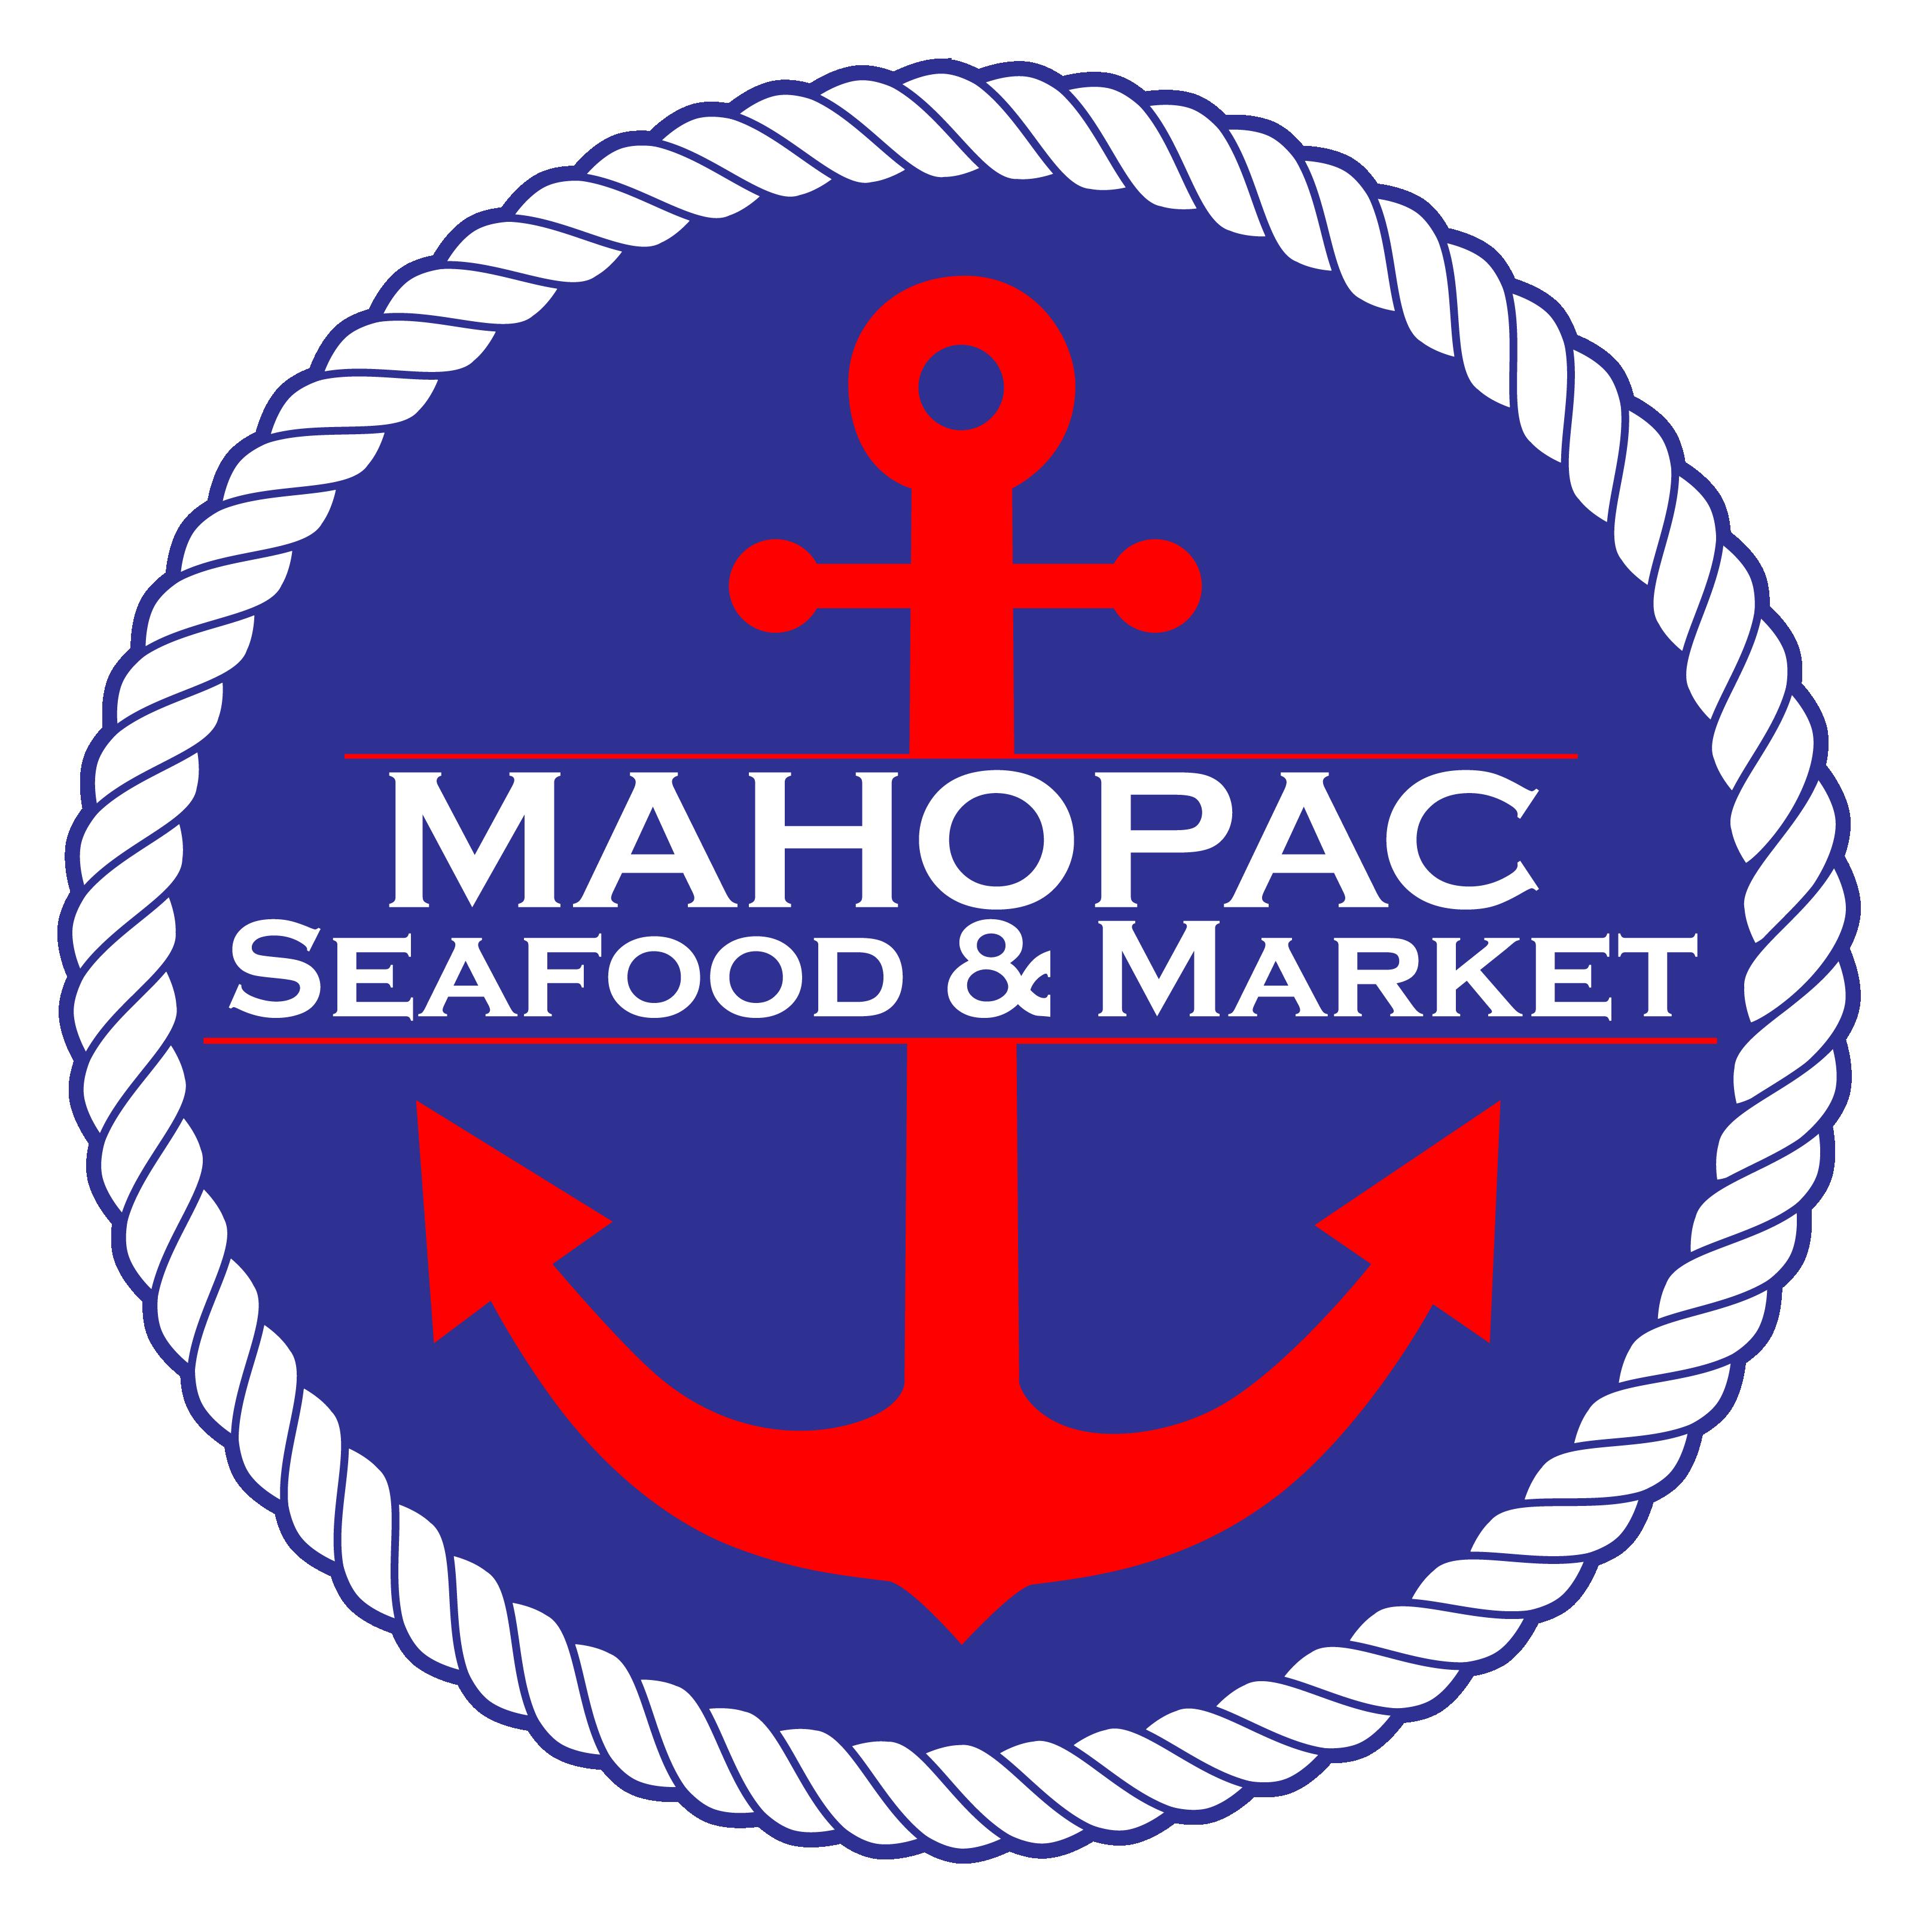 Mahopac Seafood Market Logo